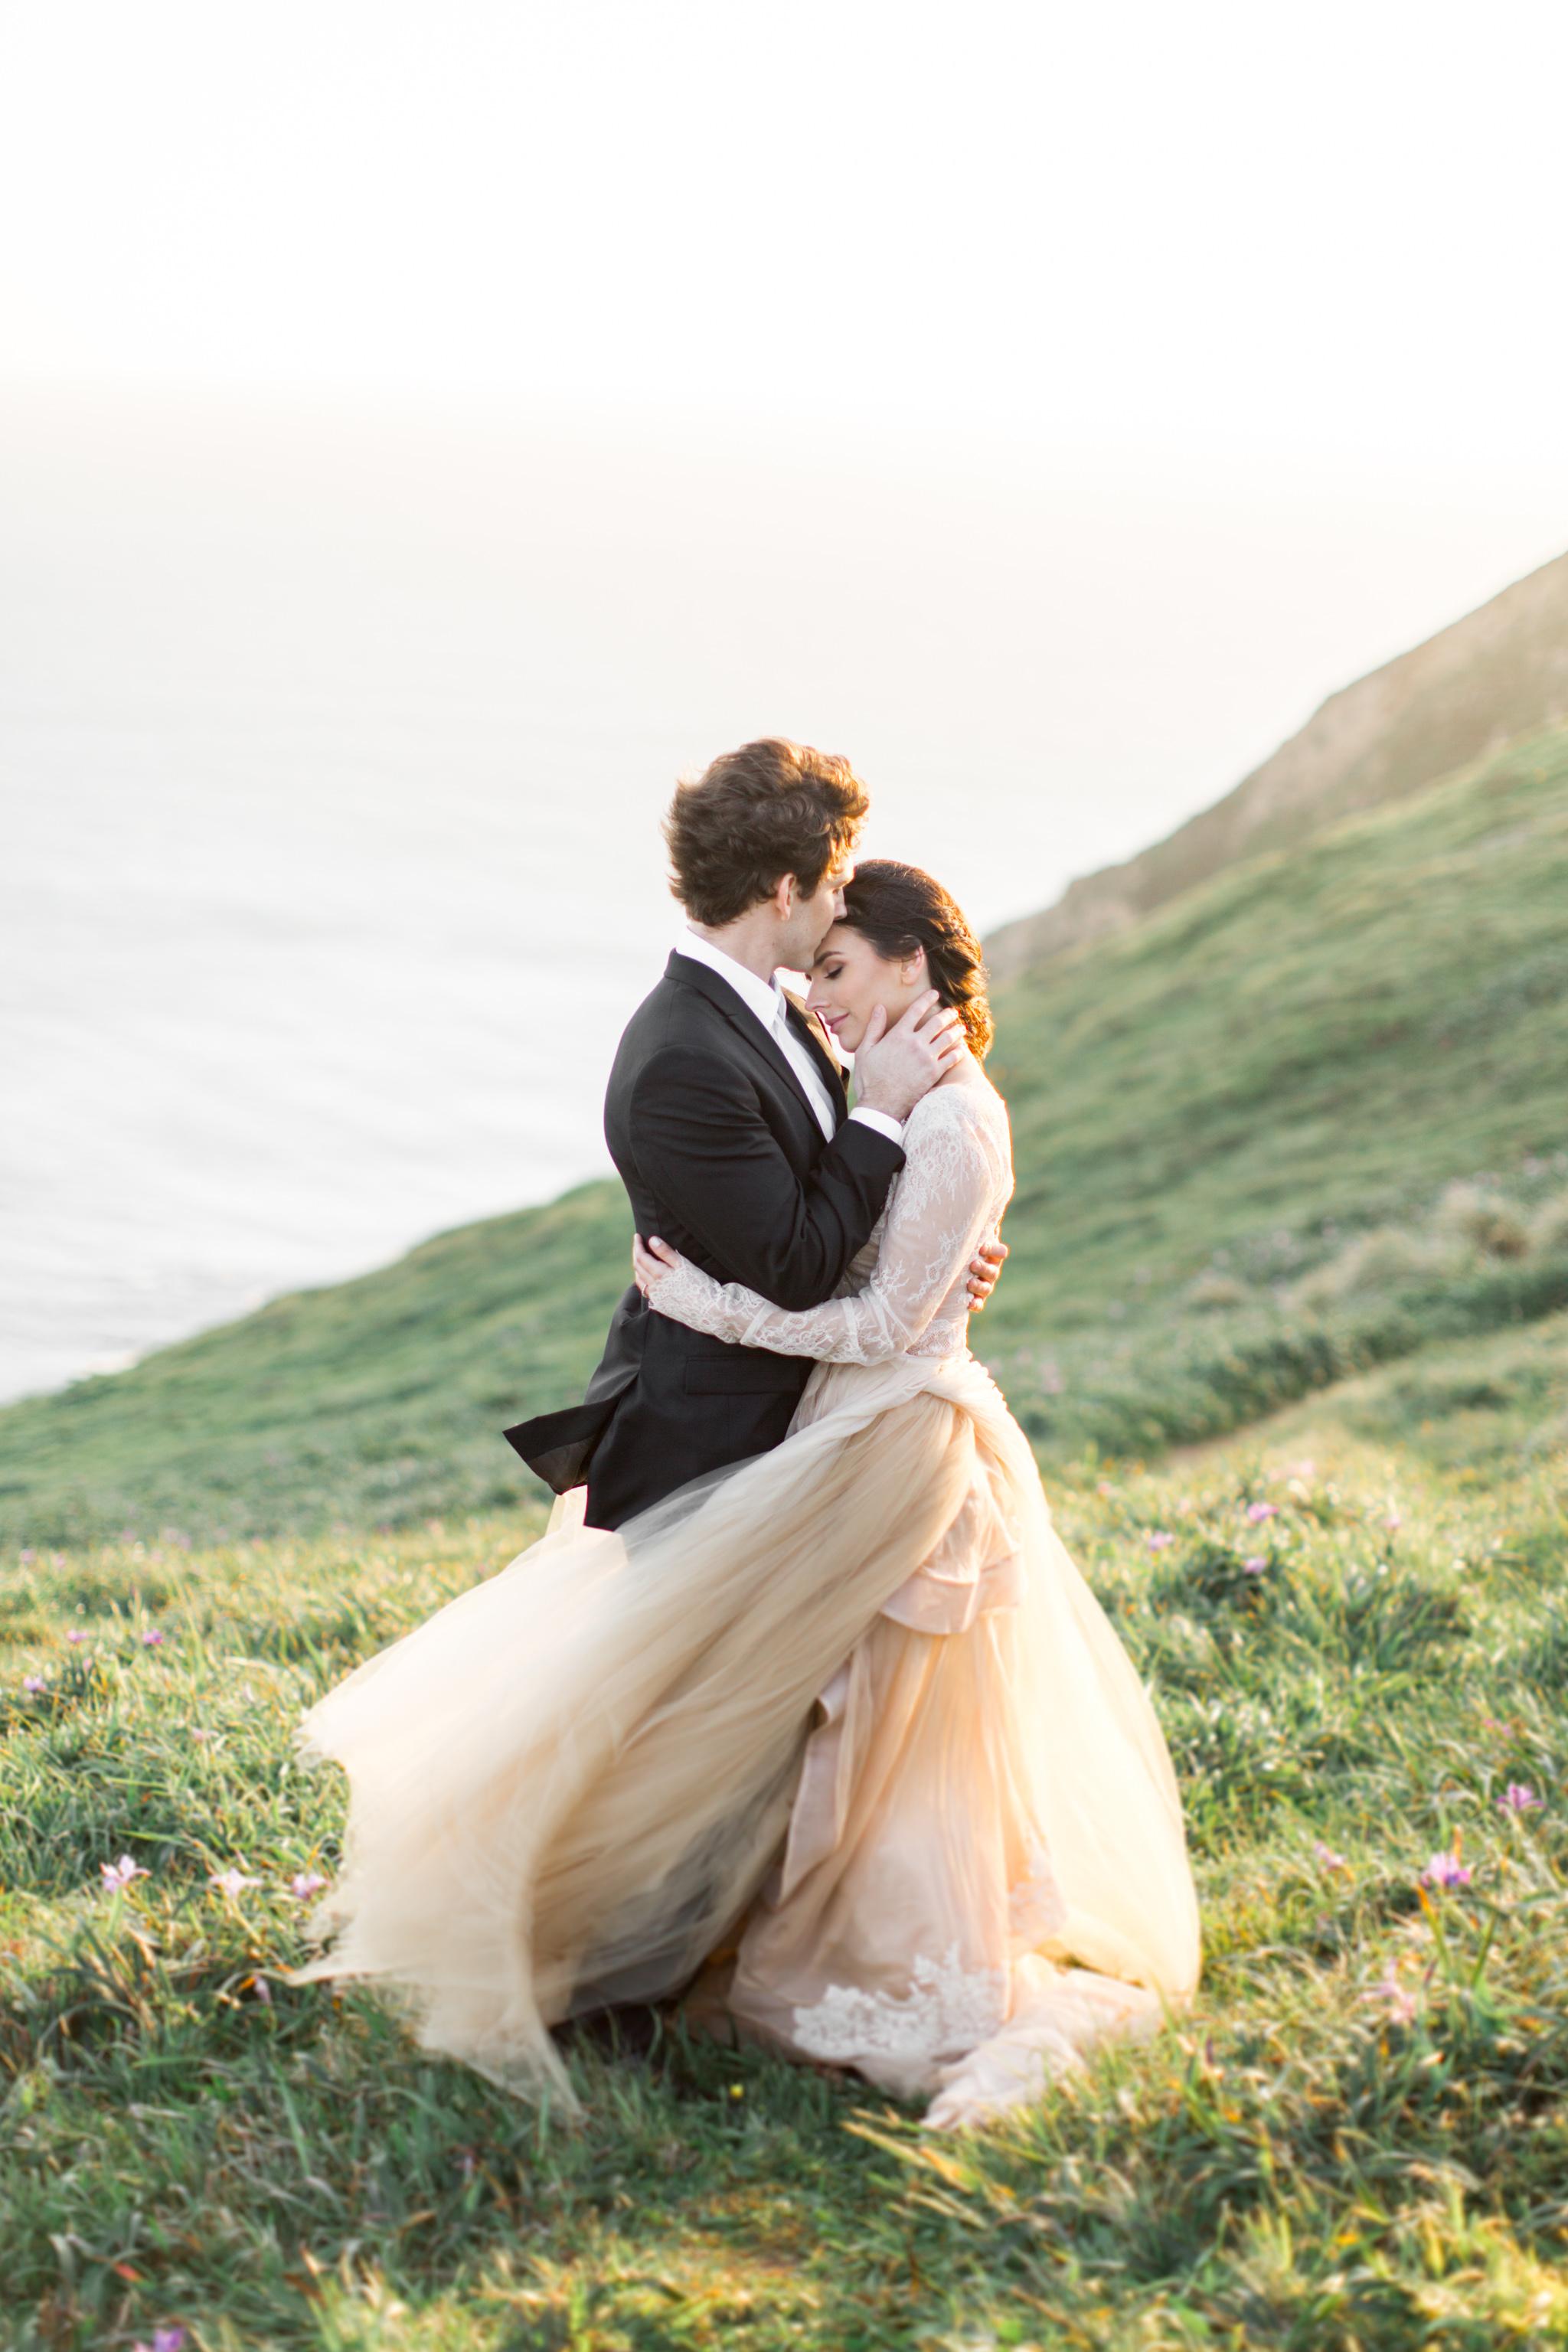 Cliffside Wedding | Tyler Rye Workshop | Point Reyes | Nicole Lapierre | Canadian Wedding Blog | Canadian Photographer | Joy Wed | Fine Art Wedding Blog | Peach Wedding Dress